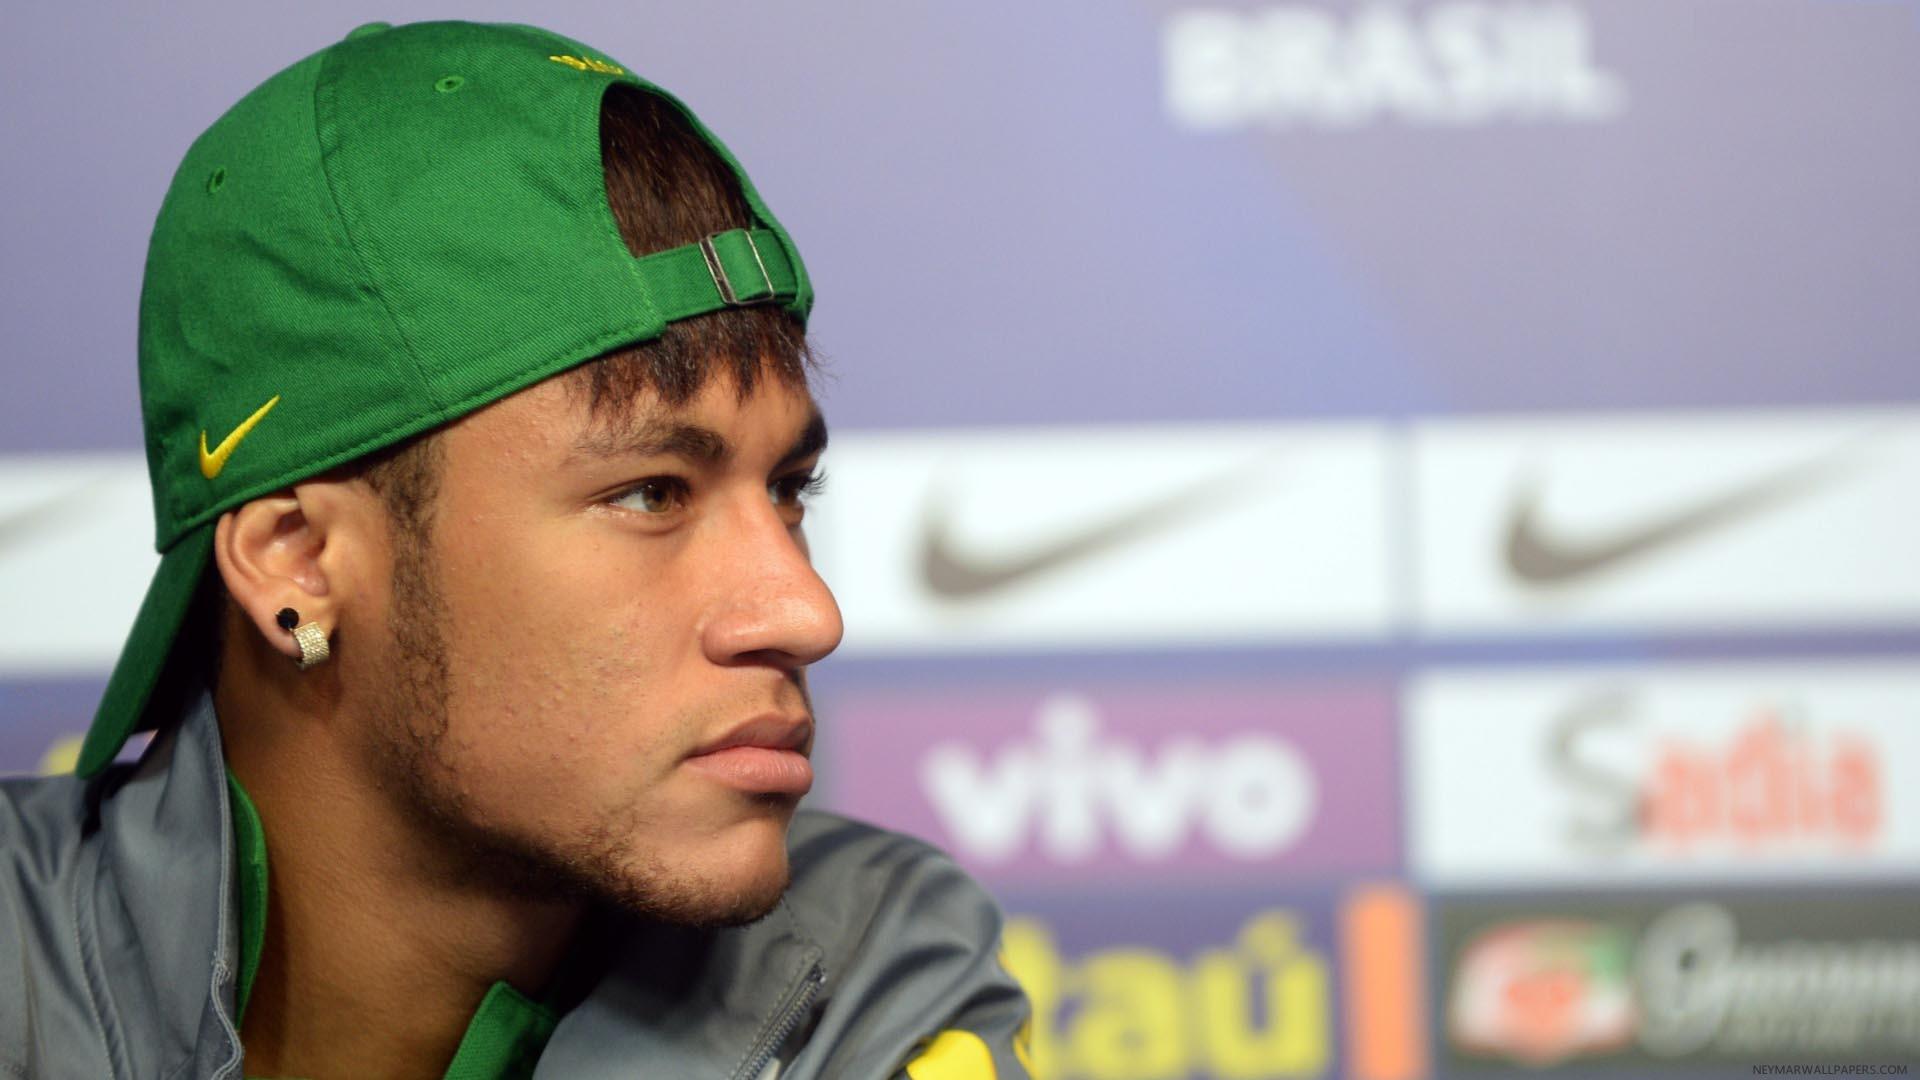 Neymar head wallpaper (3)